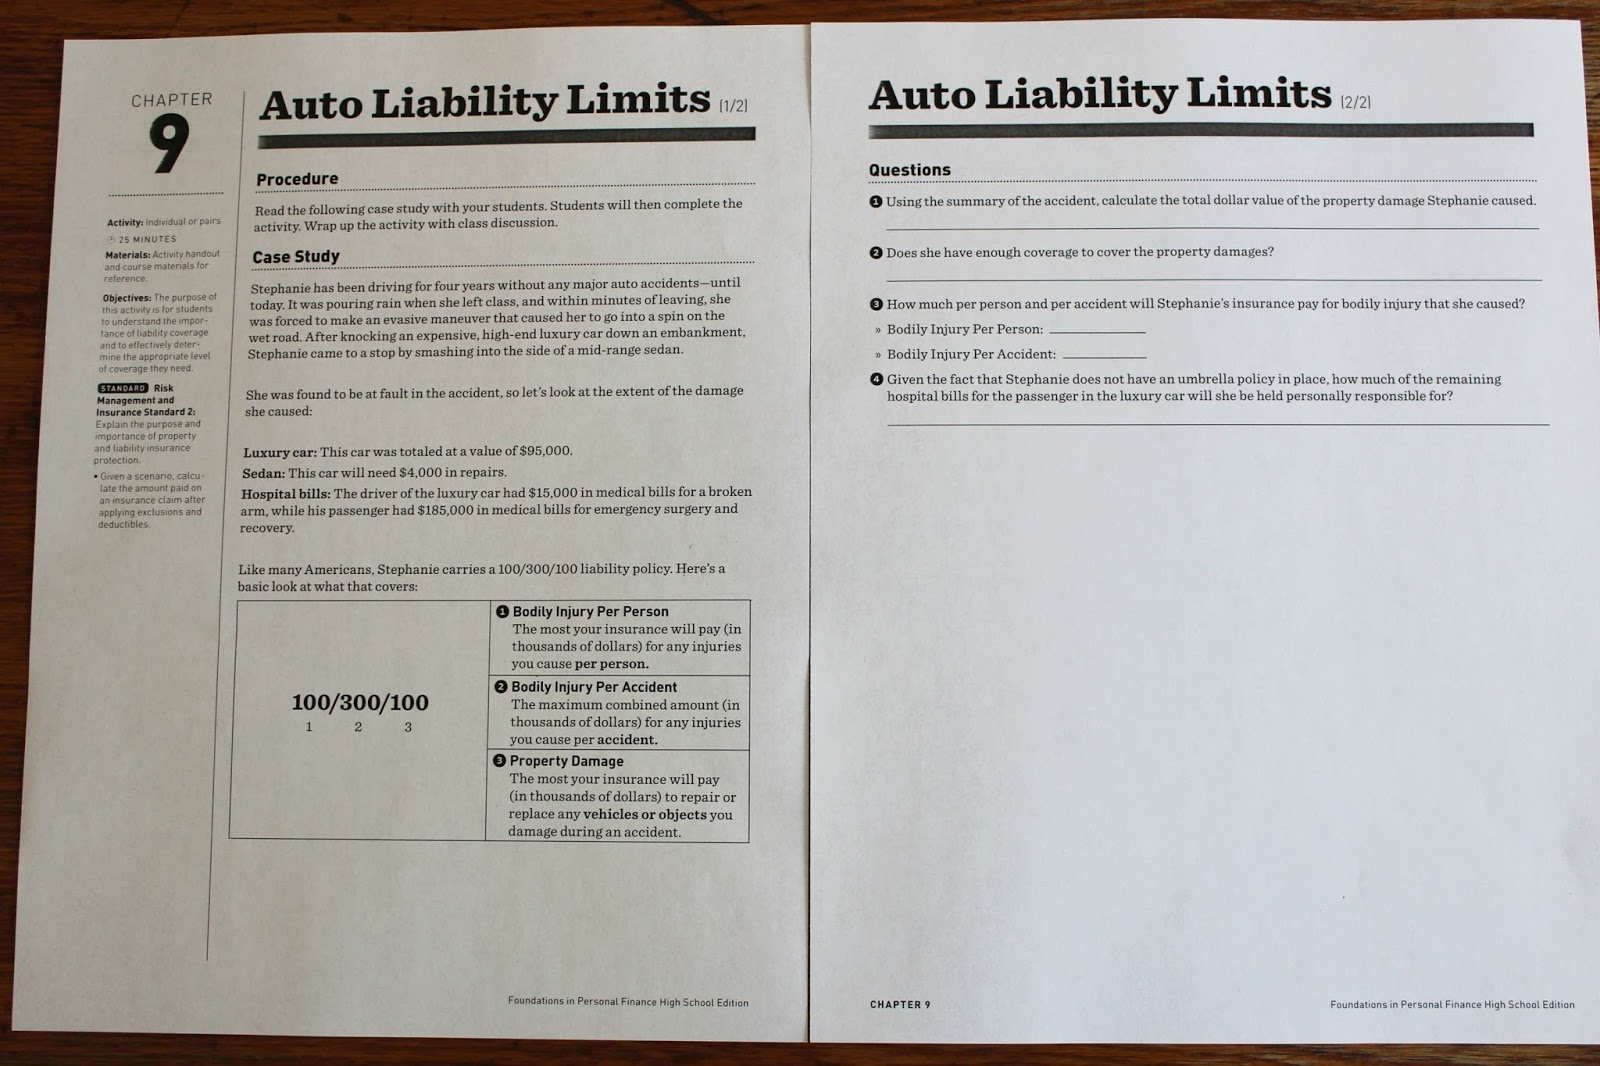 Auto Liability Limits Worksheet Answers